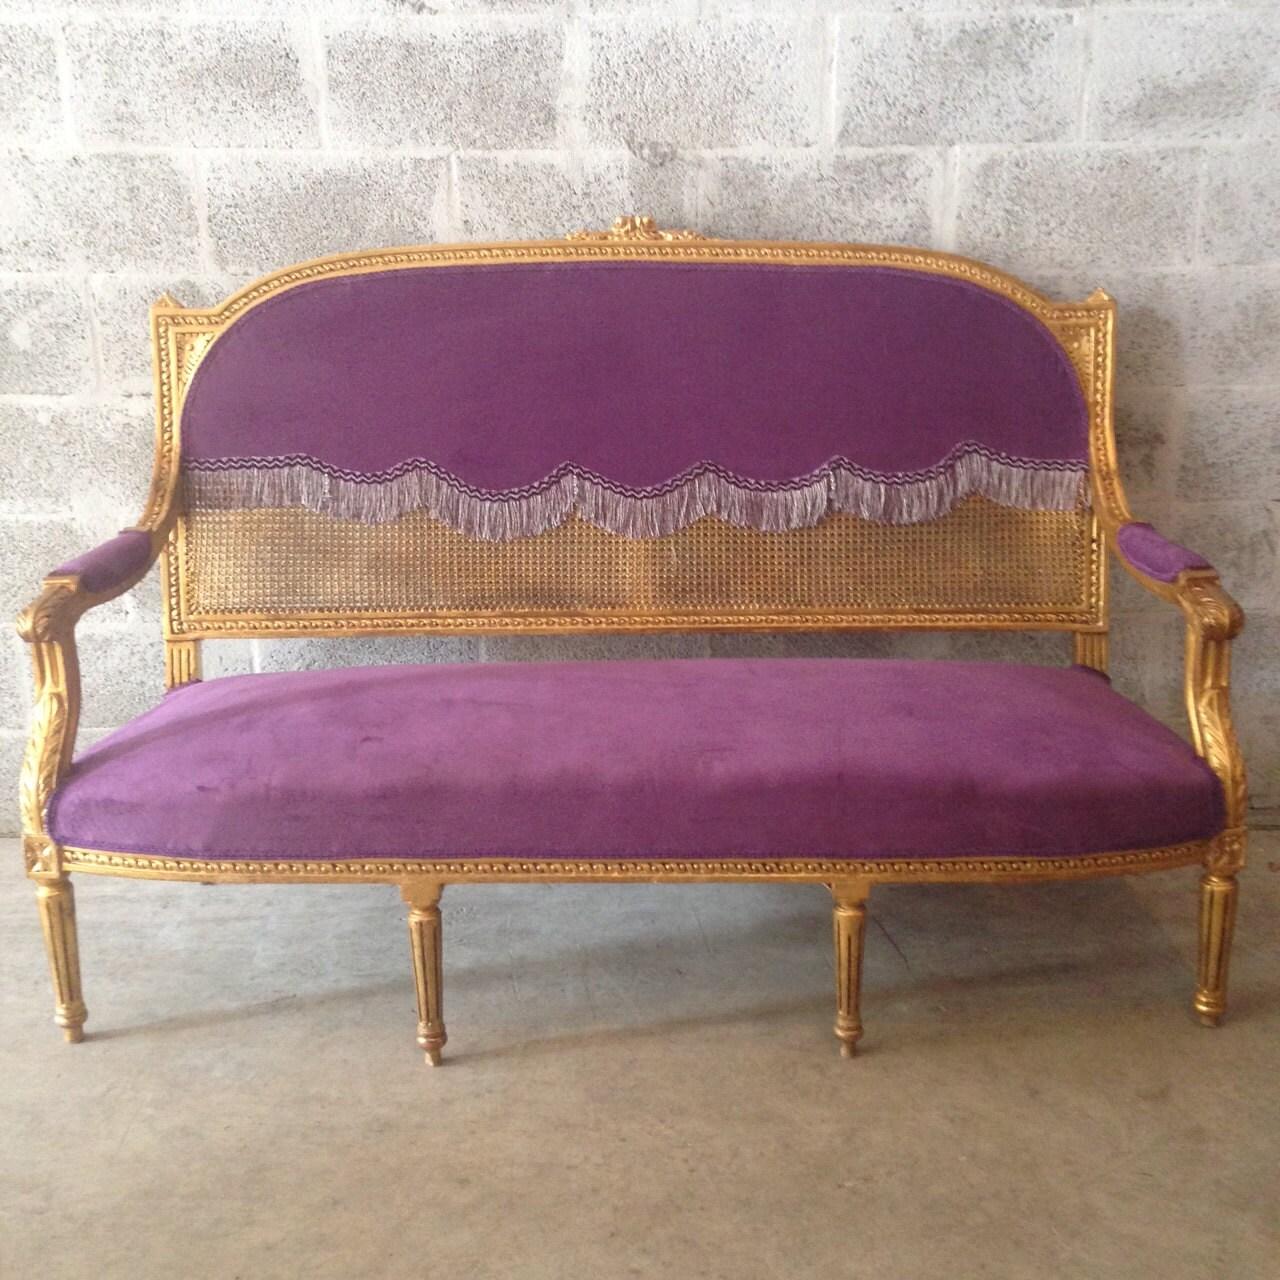 French furniture sofa -  Zoom